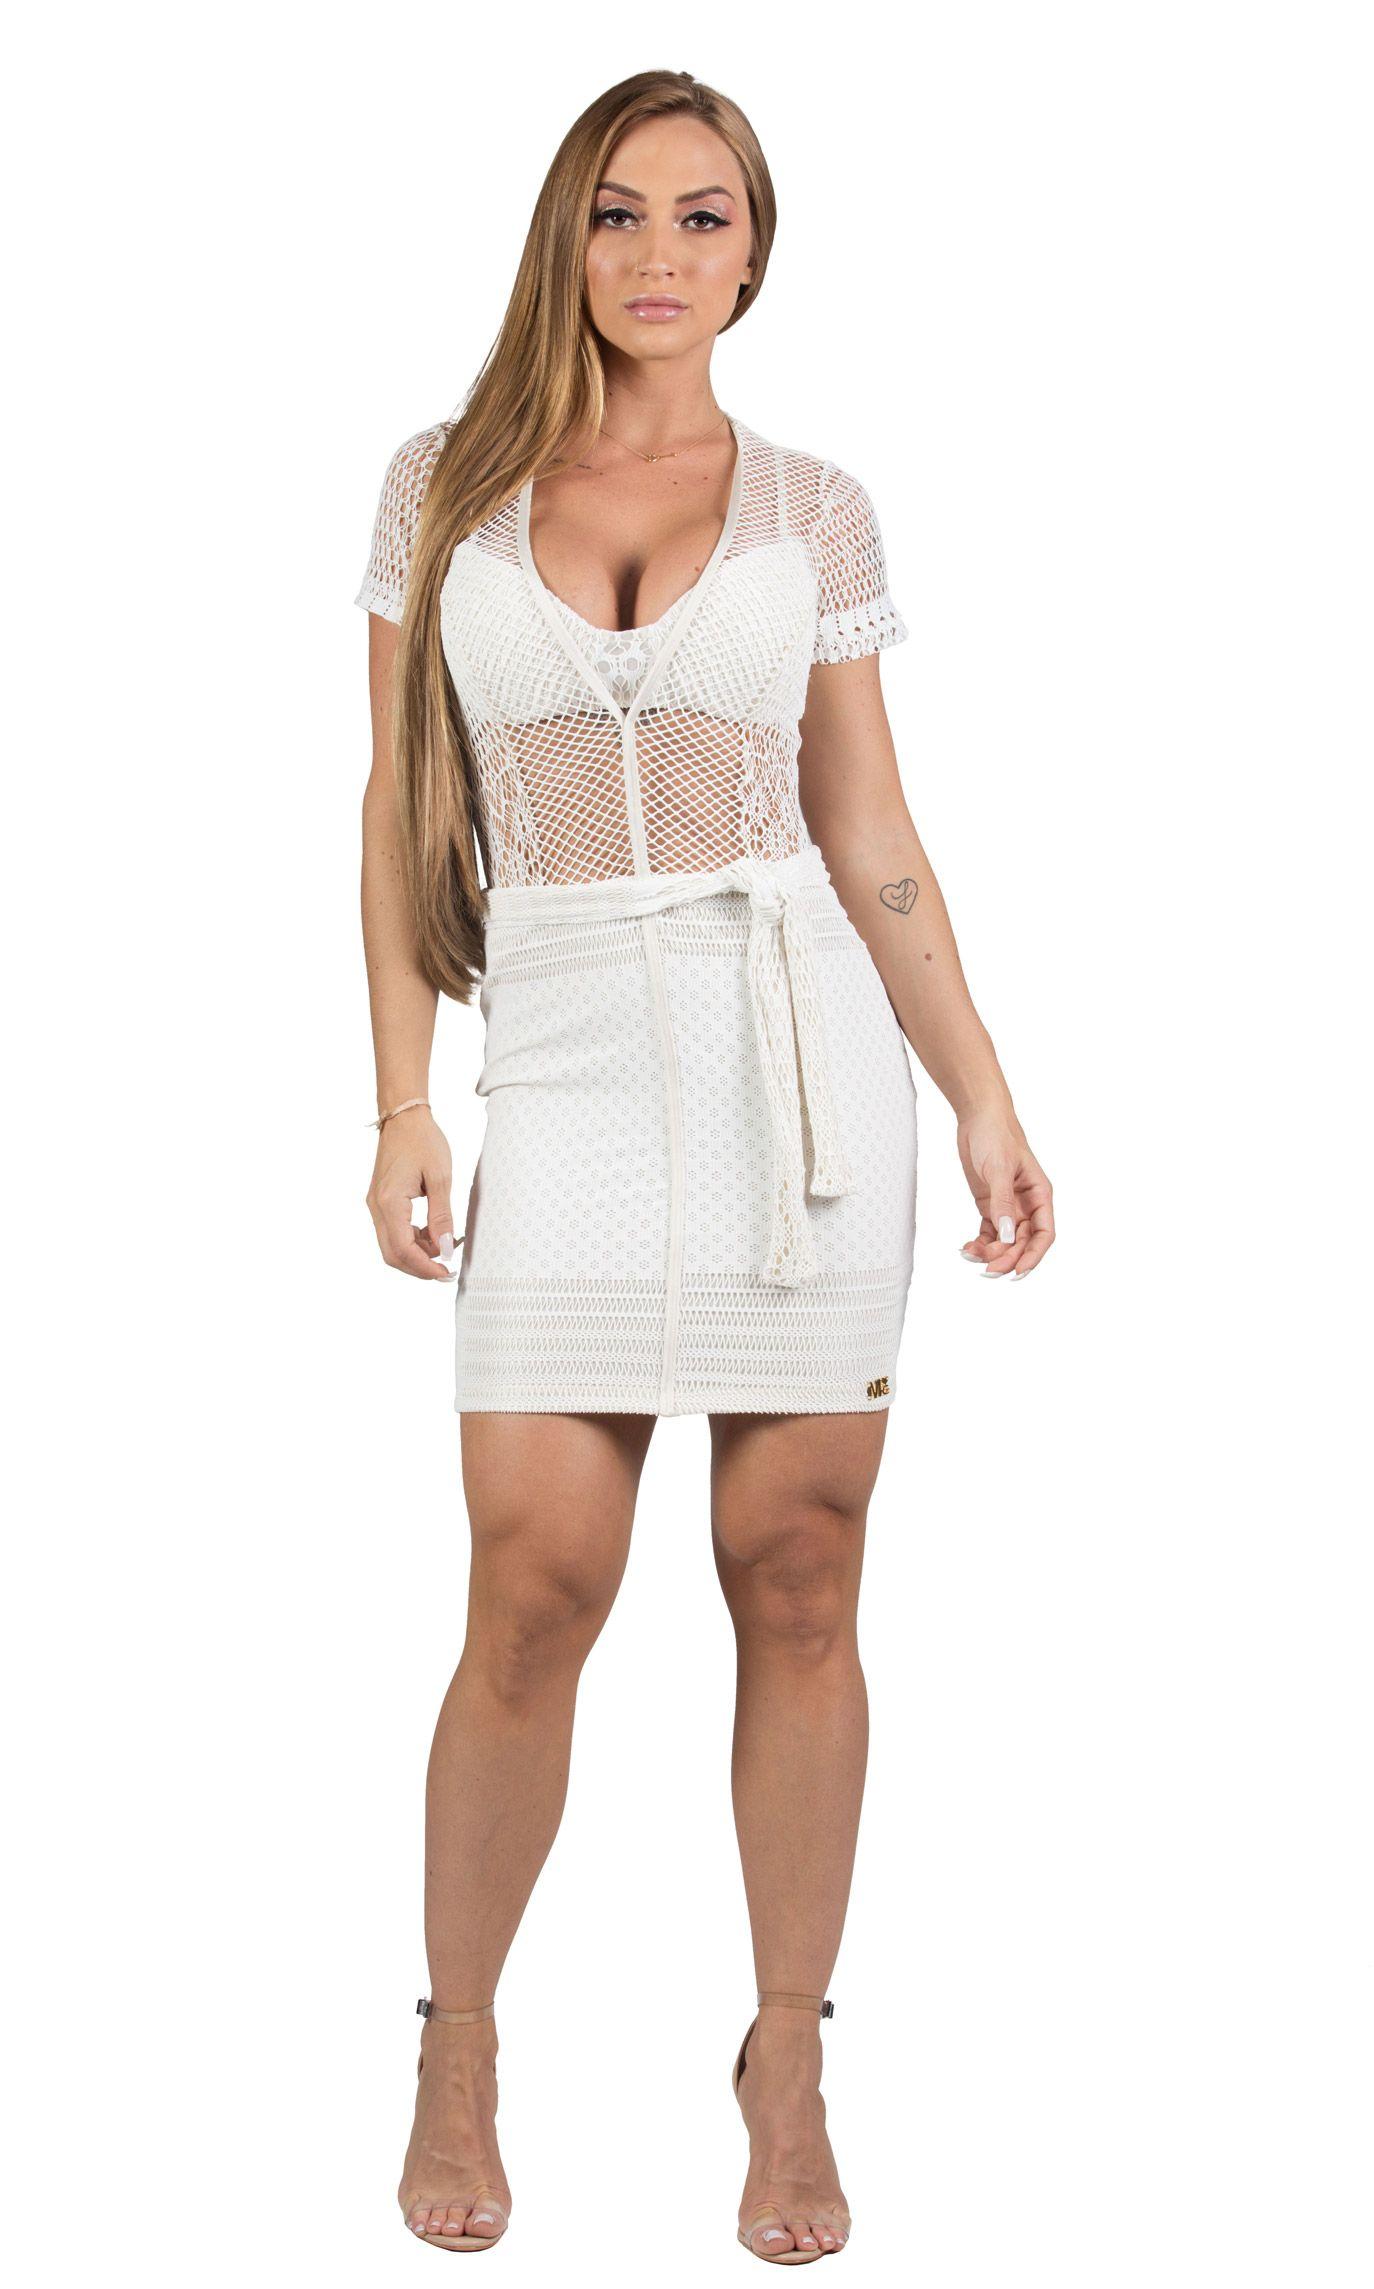 Vestido Curto + Top Bojo Maria Gueixa Off White